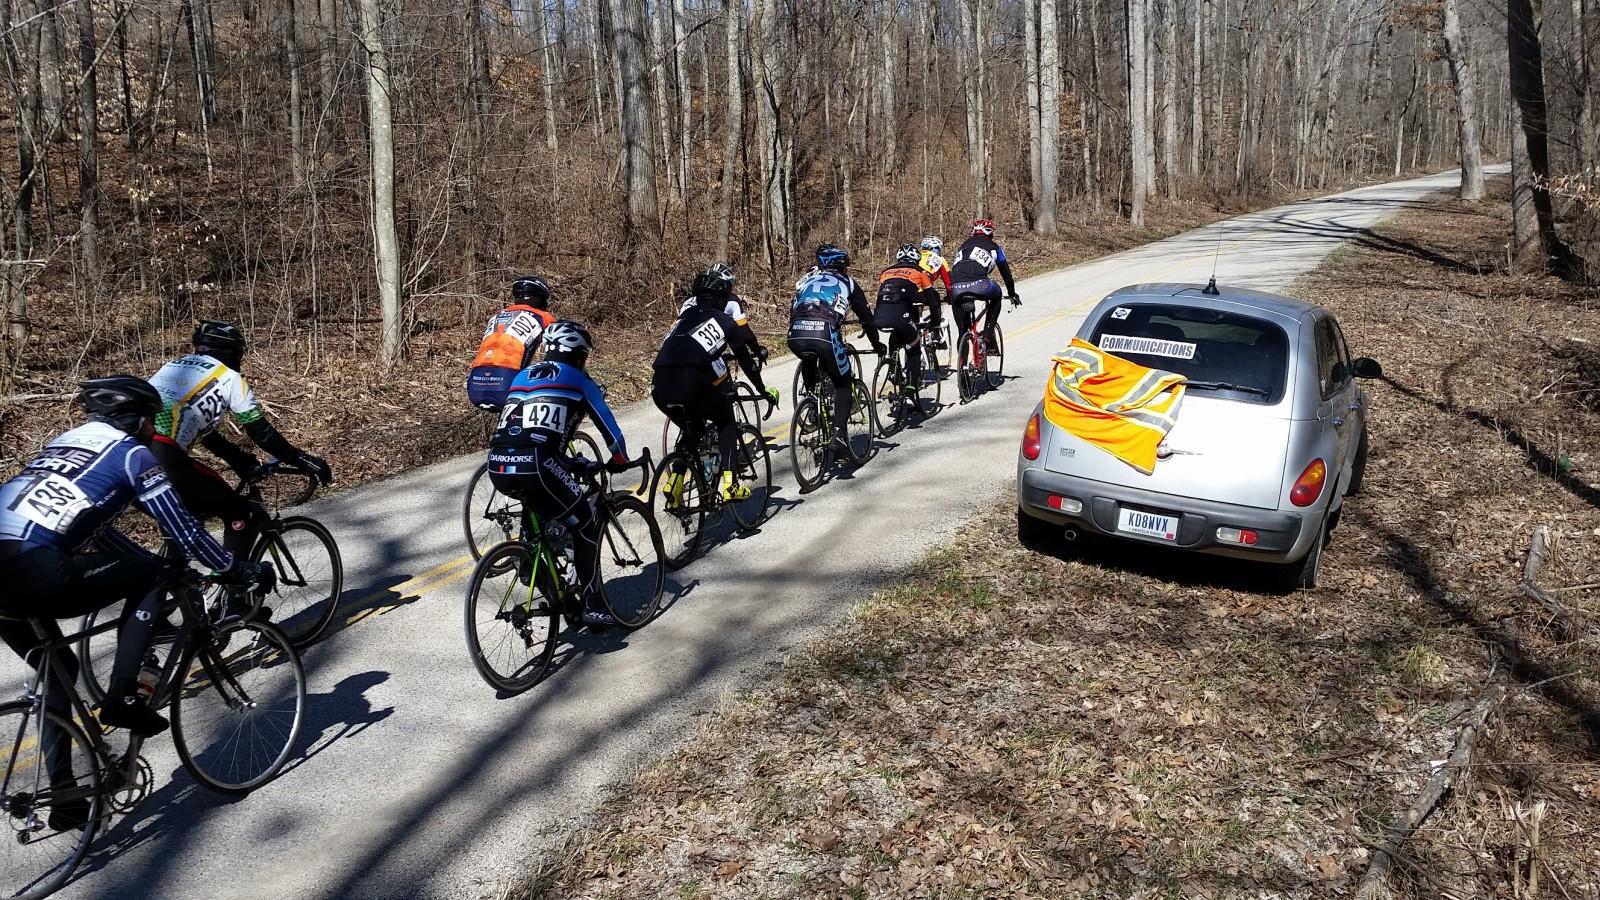 Lake Hope Bicycle Race 2015 - 5 - KD8WVX [Desktop Resolution]